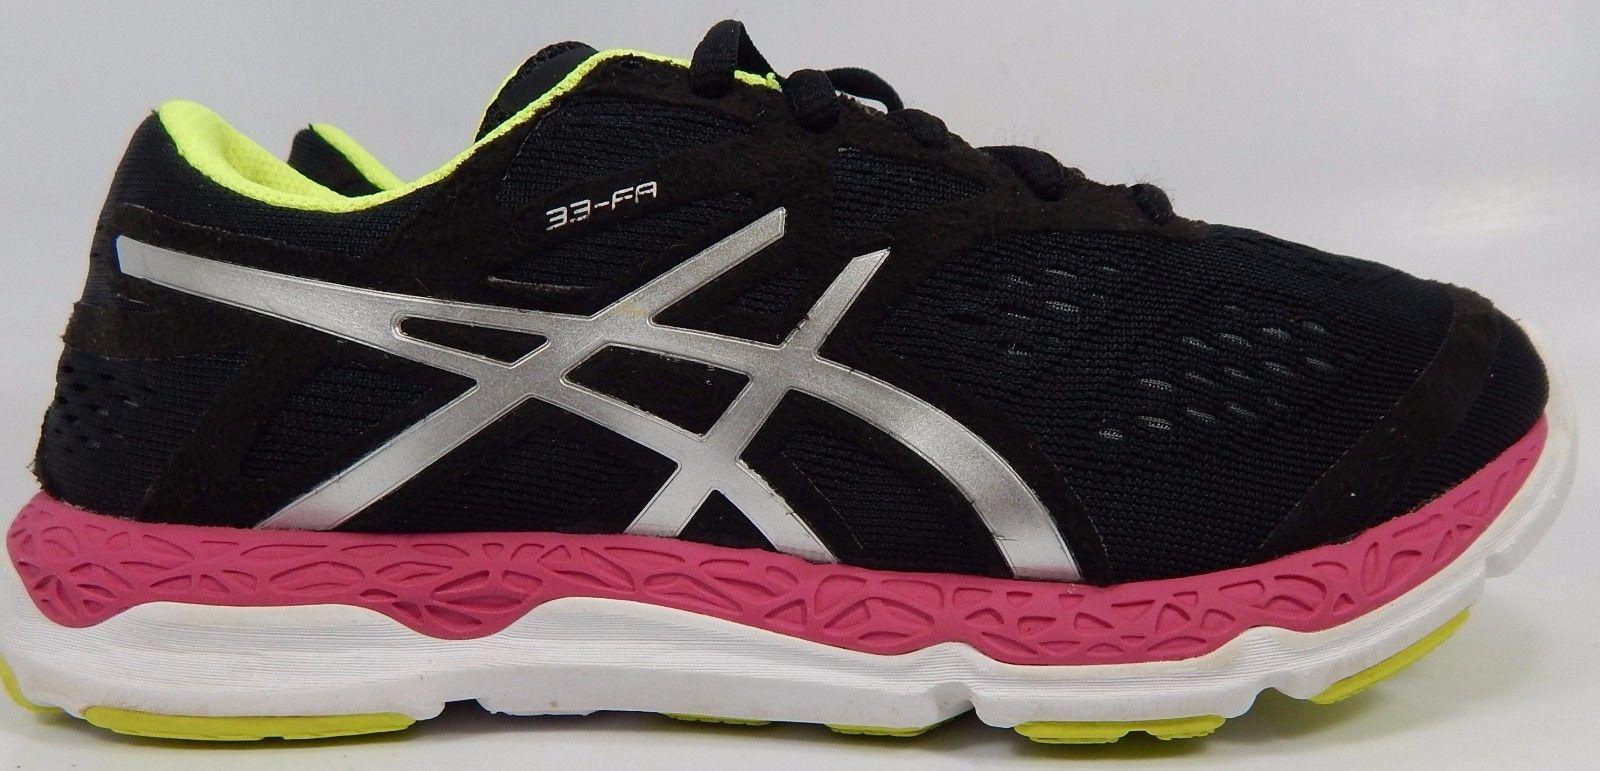 Asics Gel 33-FA Women's Running Shoes Size US 6 M (B) EU 37 Black Pink T583N